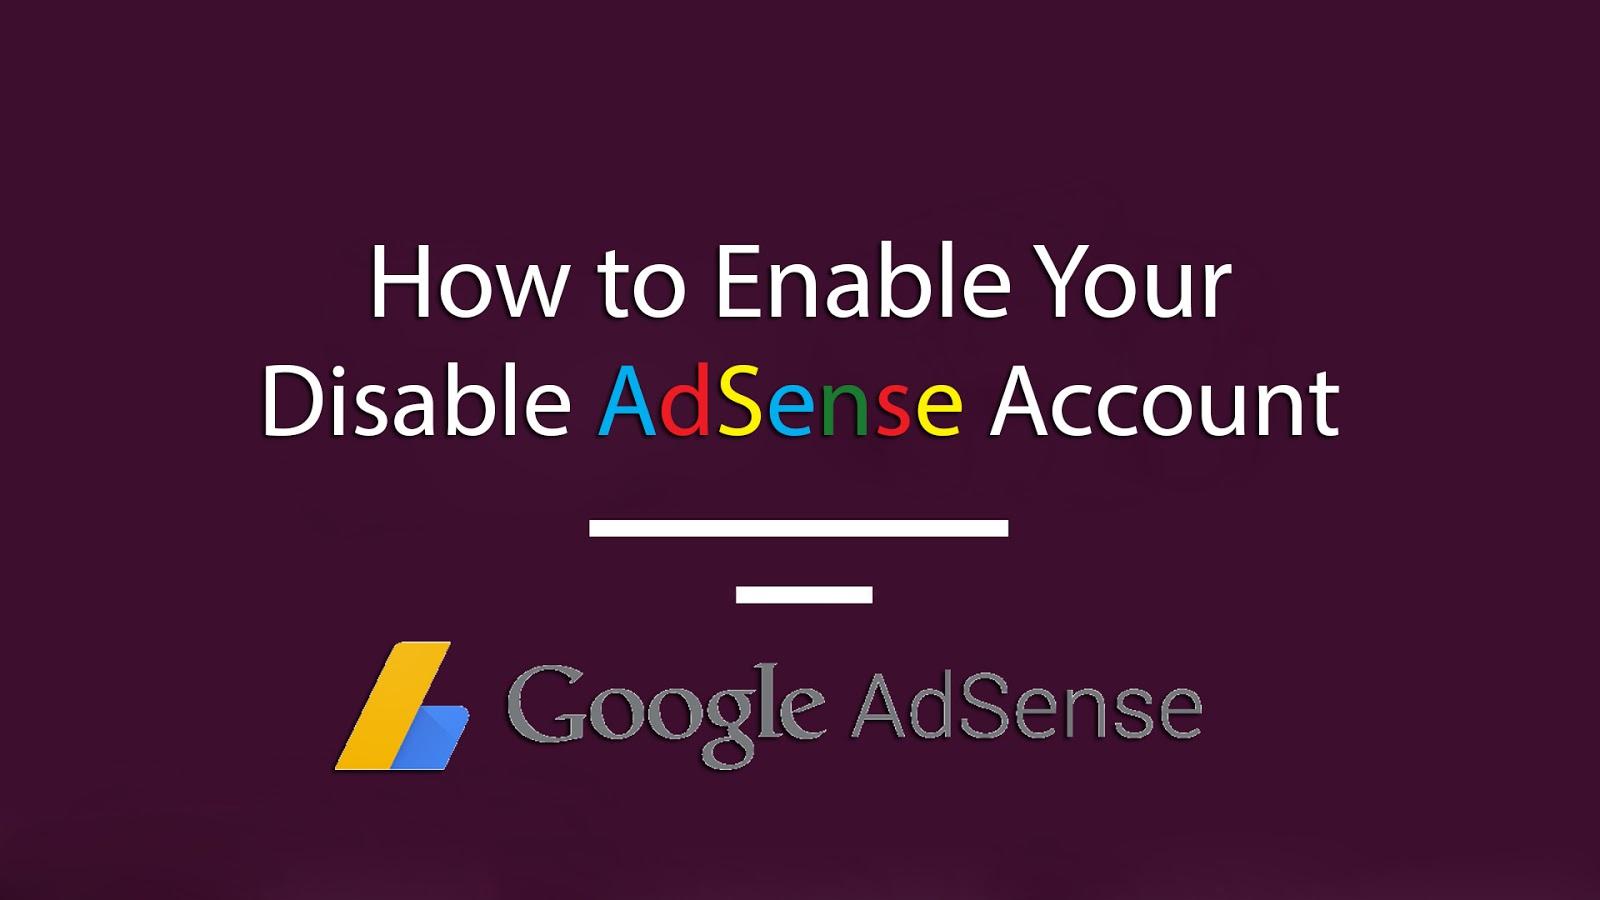 AdSense Account